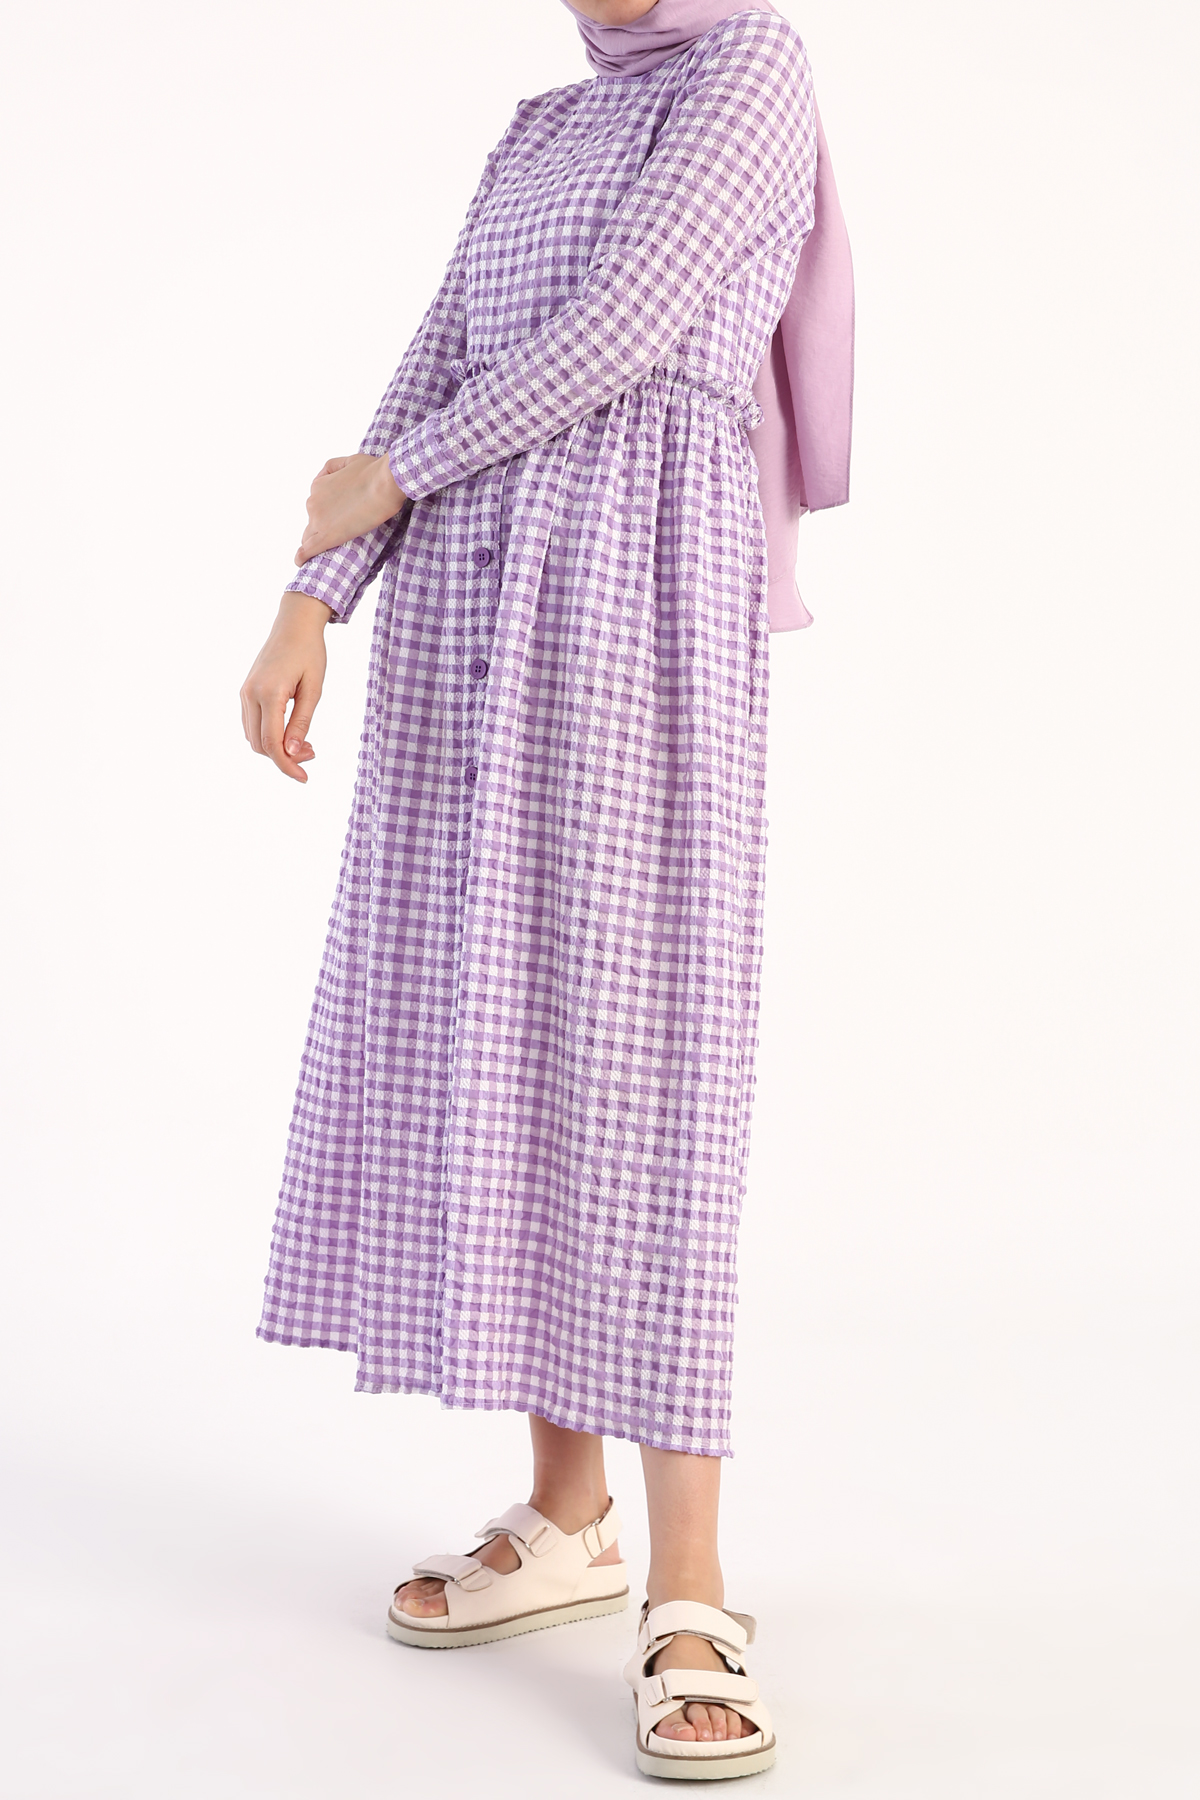 Gingham Patterned Dress